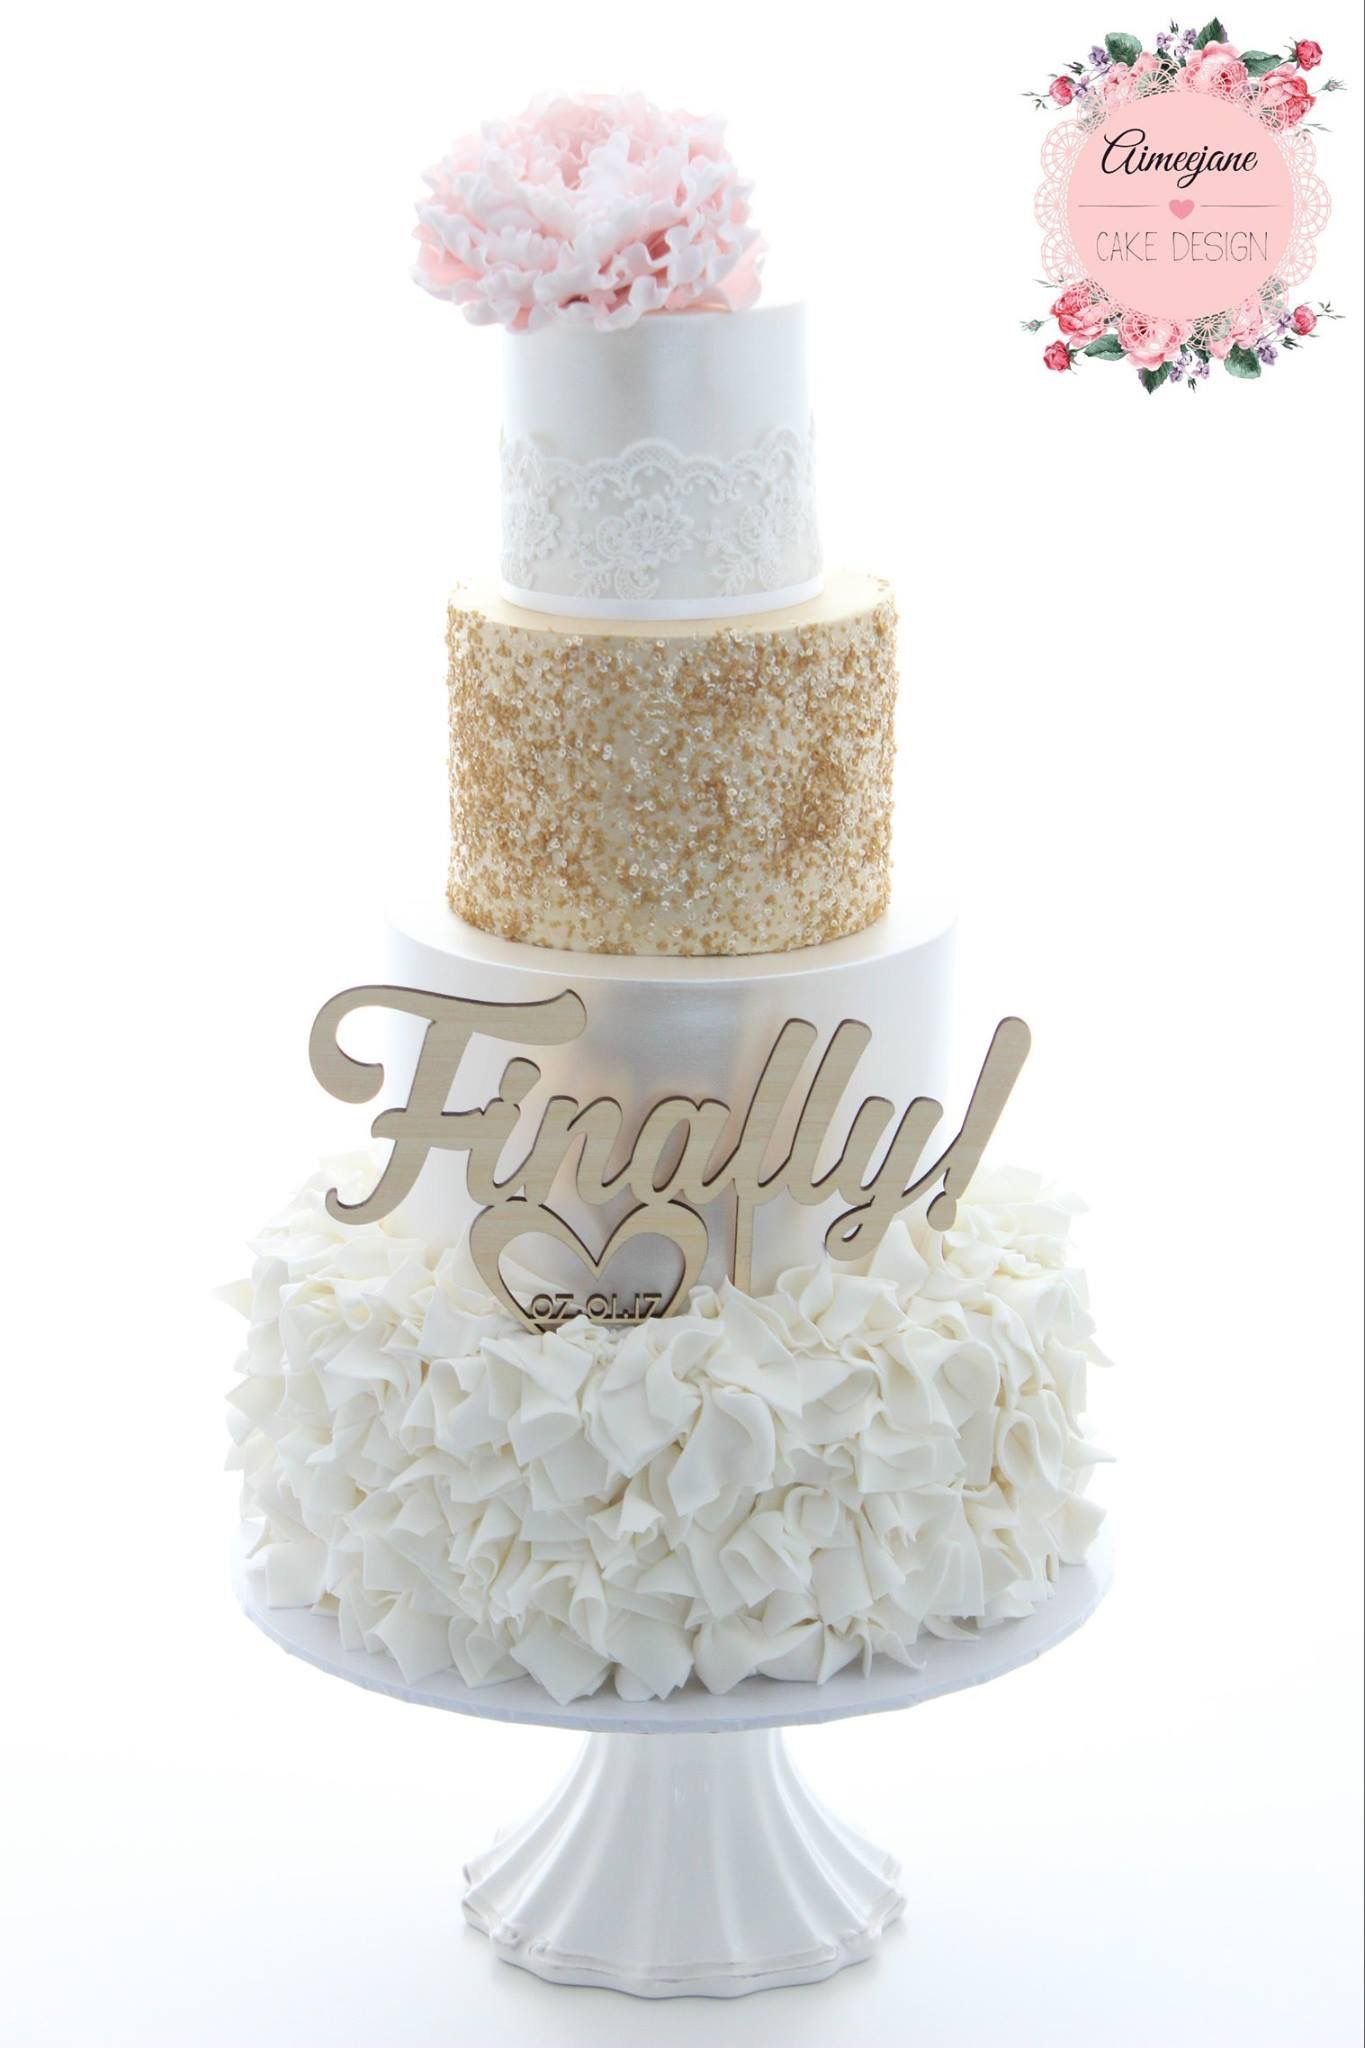 Aimeejane Cake Design Wedding Cake. Lace, sugar peony, texture ...